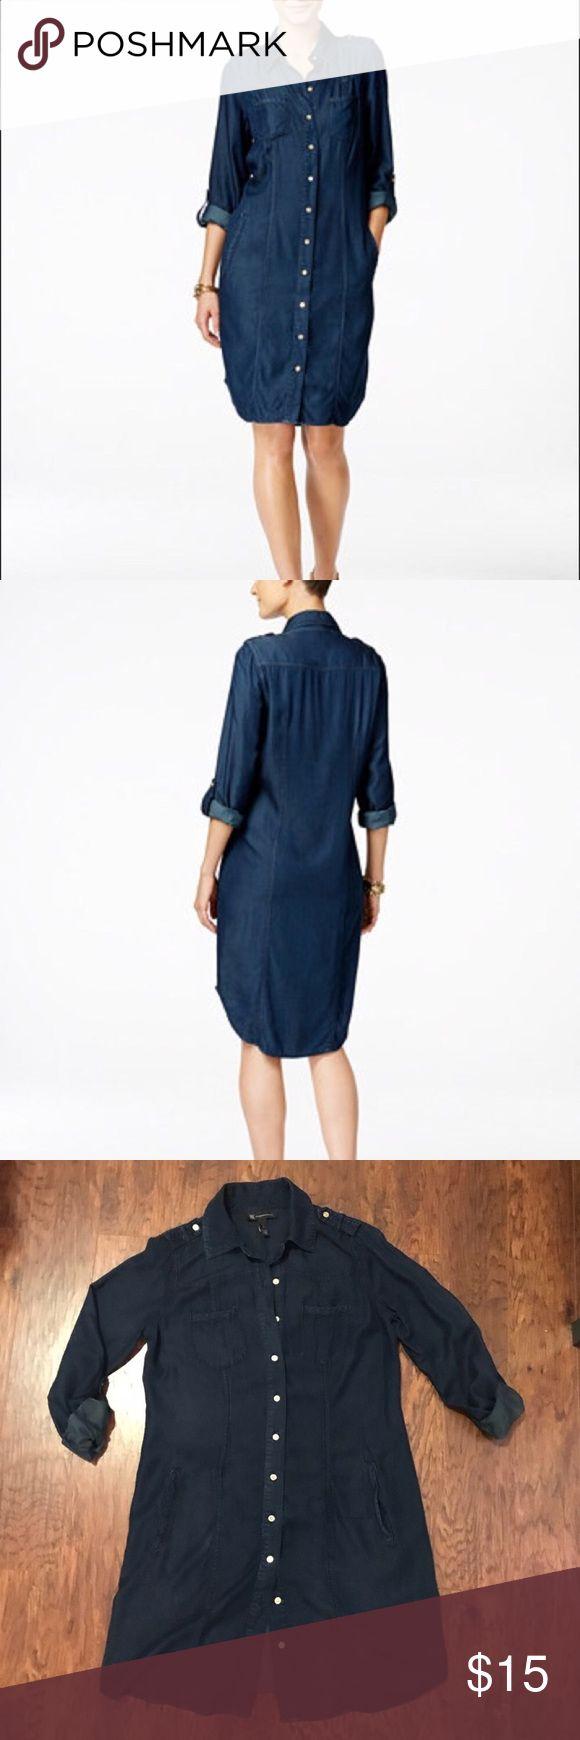 INC Shirt Dress Lightweight denim-like viscose/lyocell shirt dress. Shirt tail hem hits at knee. Chest and side pockets. Shoulder epaulets. Roll-tab sleeves. Worn once. Good condition. INC International Concepts Dresses